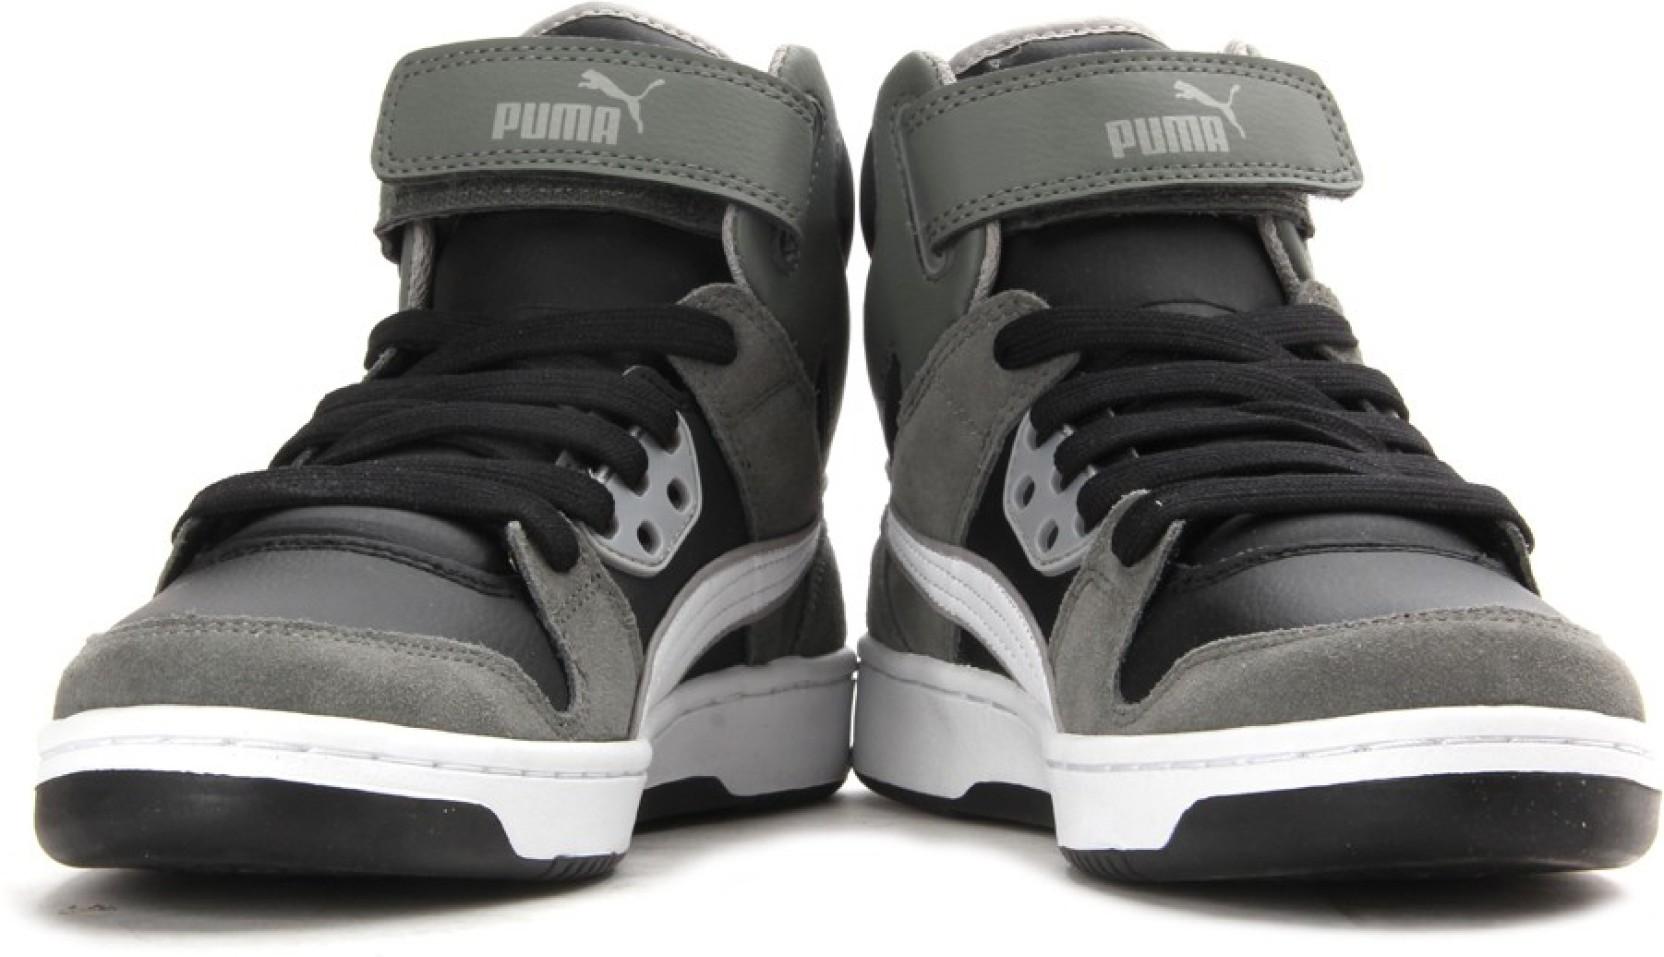 8d194060971 Puma Rebound Street SD Men Mid Ankle Sneakers For Men - Buy black ...